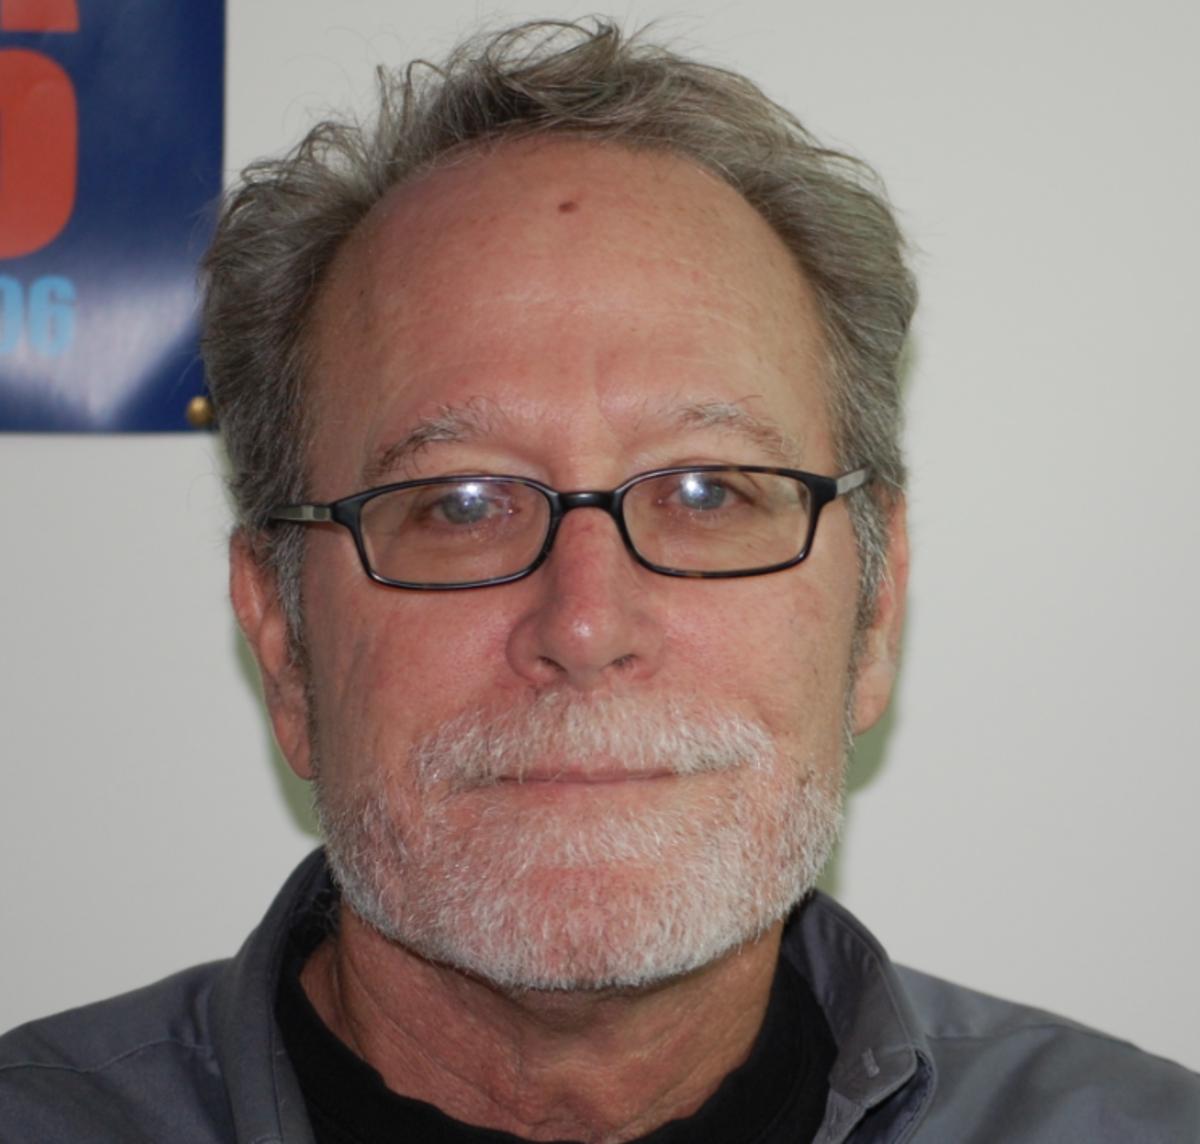 Professor David Jaffee Photo Courtesy of Sarah Ricevuto